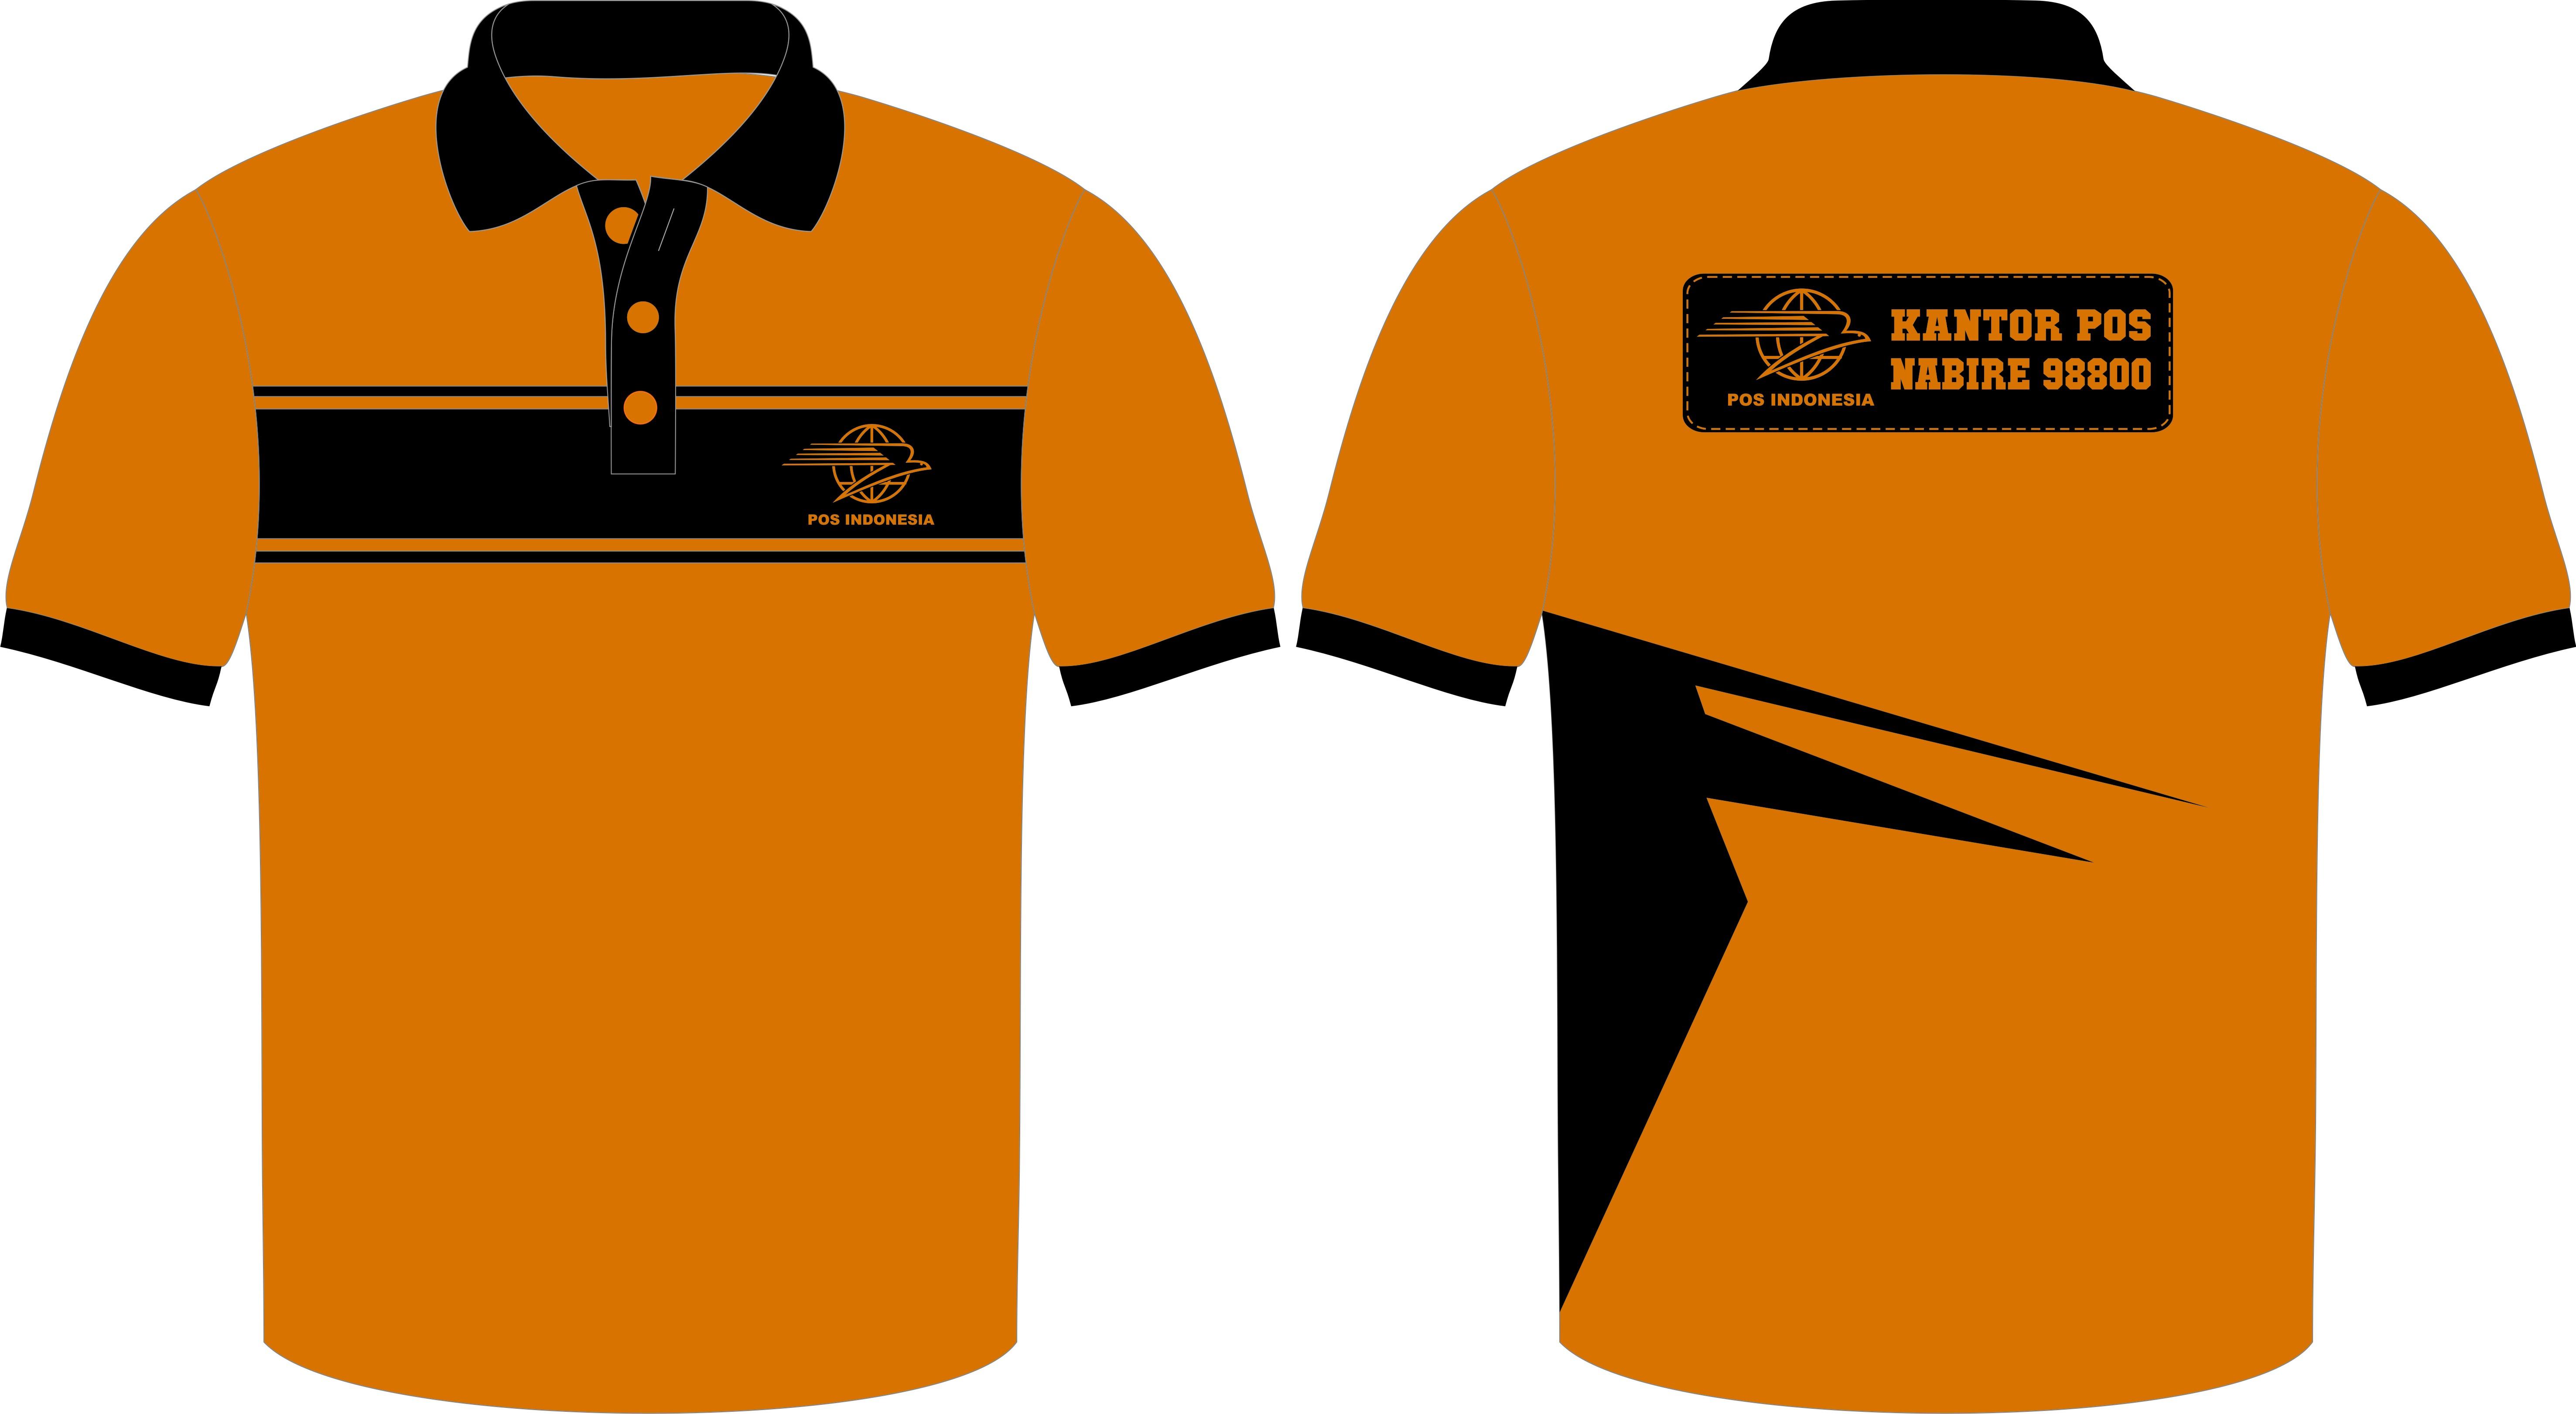 Seragam Kaos Poloshirt